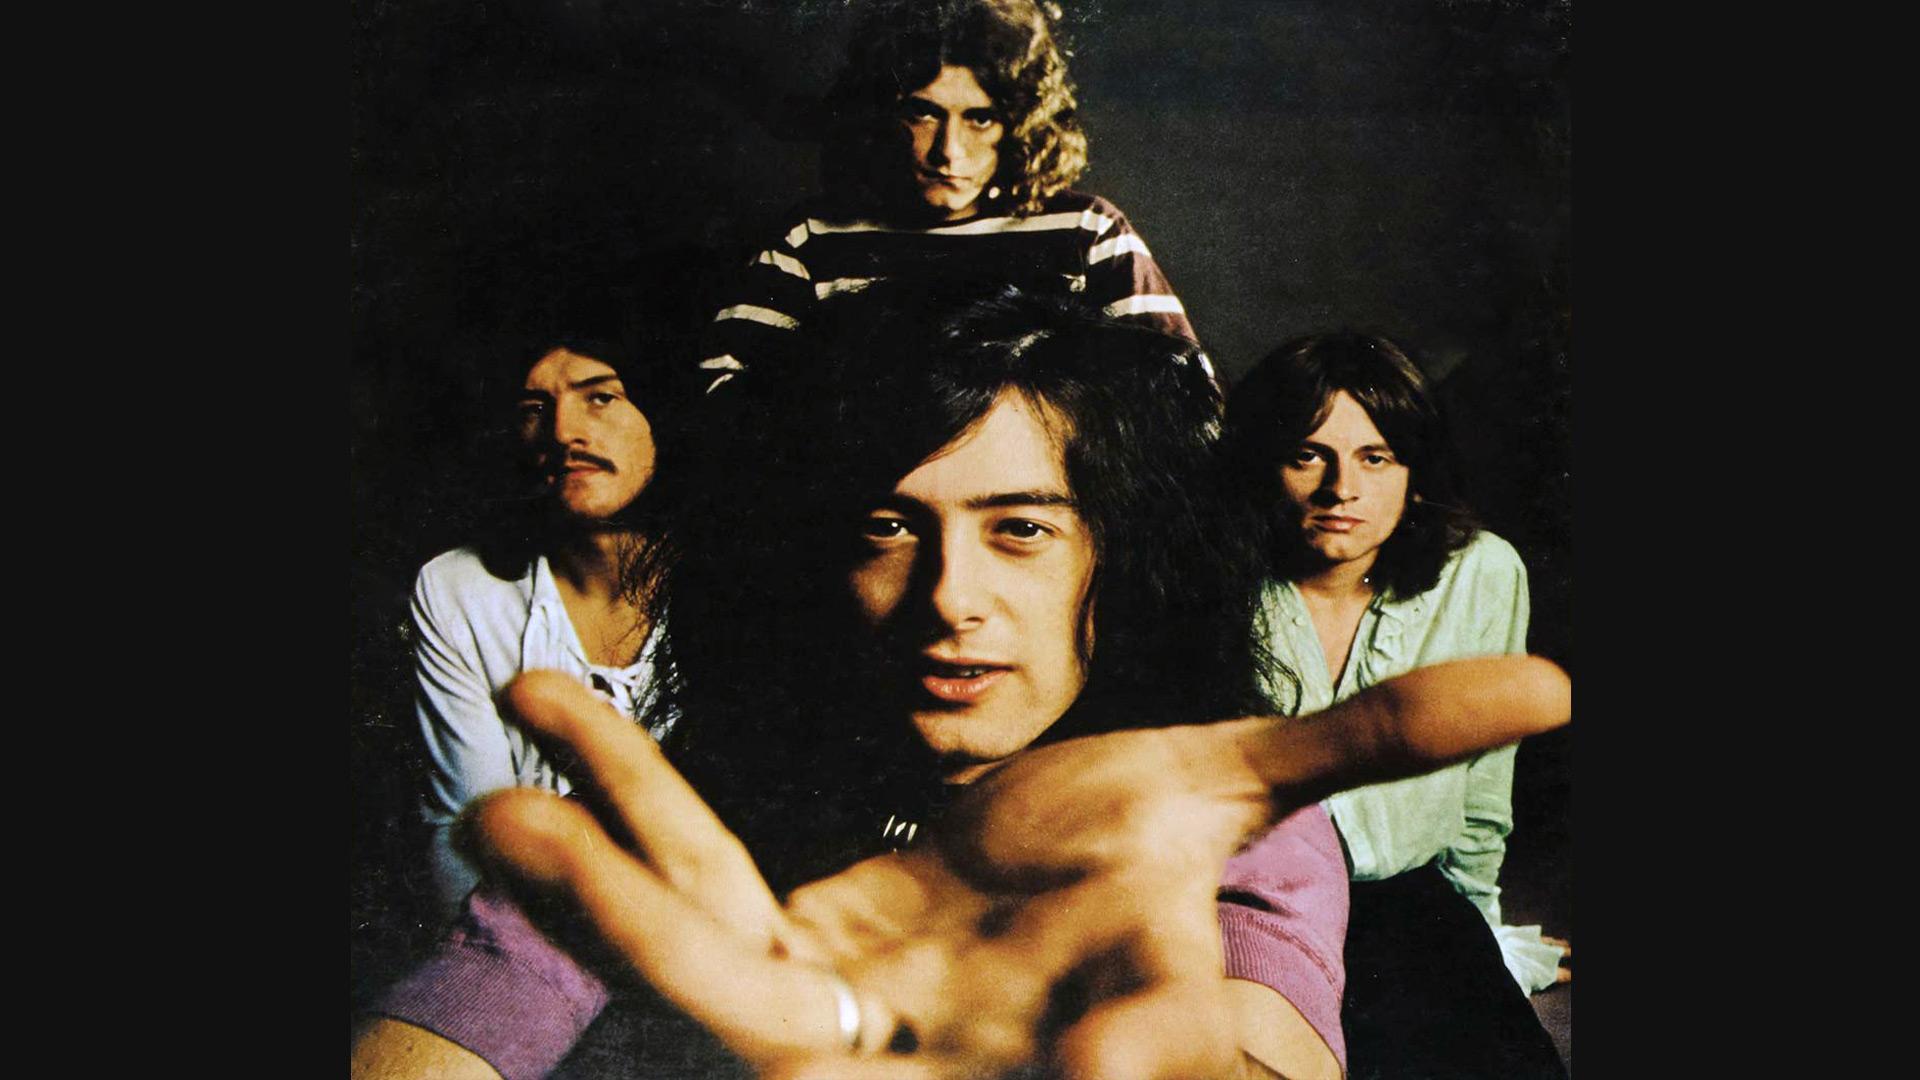 led zeppelin Led Zeppelin in Pictures wallpaper wp1207049